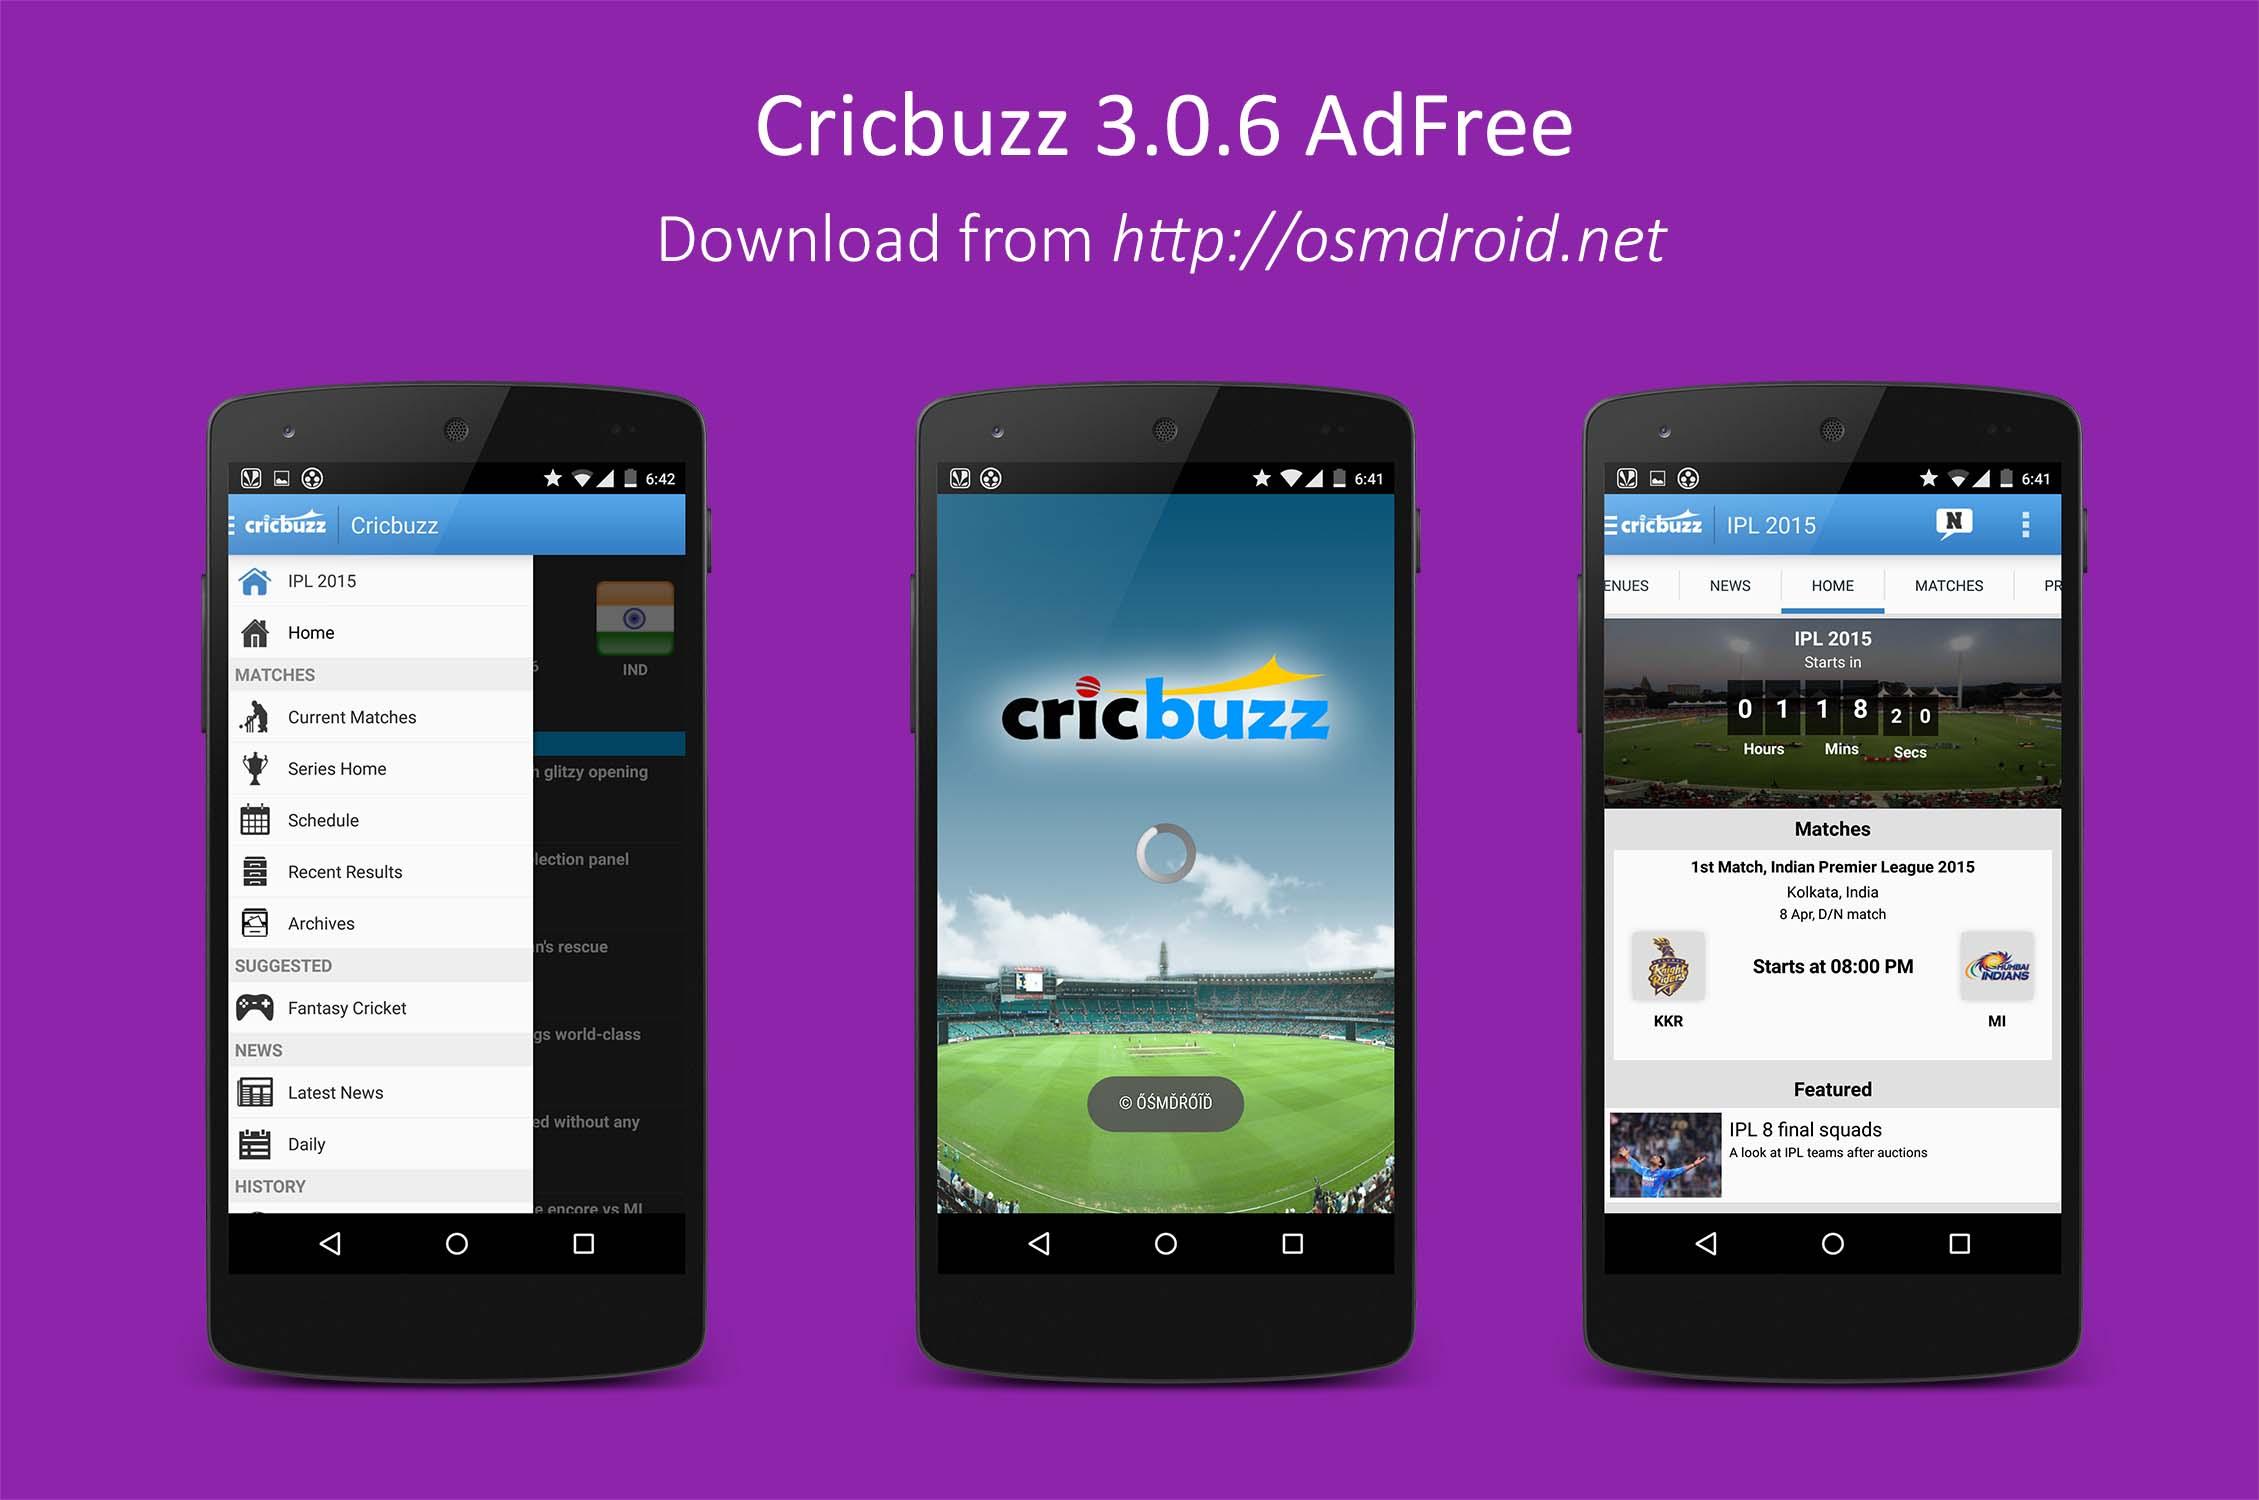 Cricbuzz 3.0.6 Modded AdFree